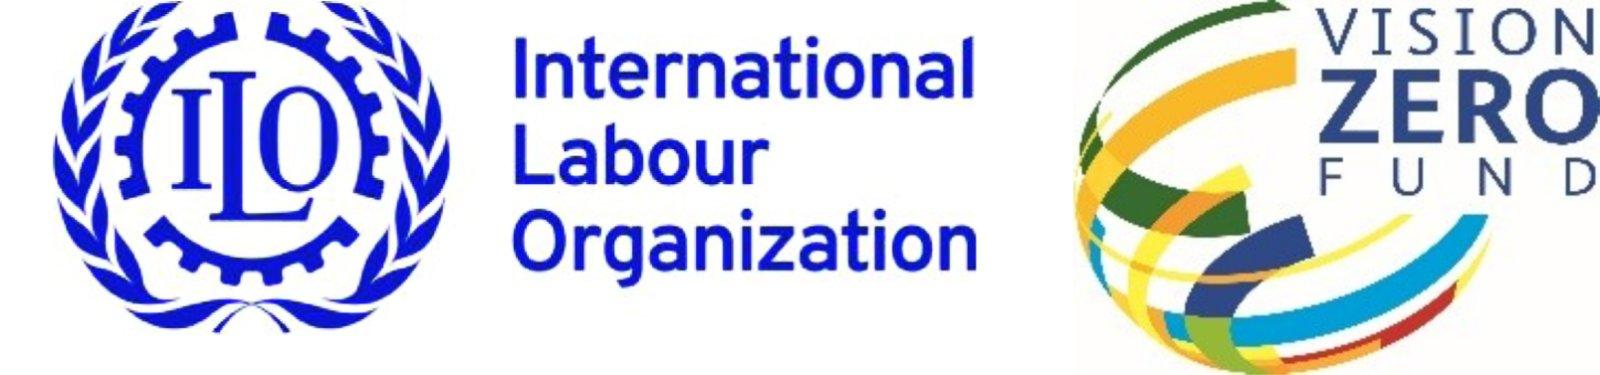 ILO Myanmar, VISION ZERO FUND